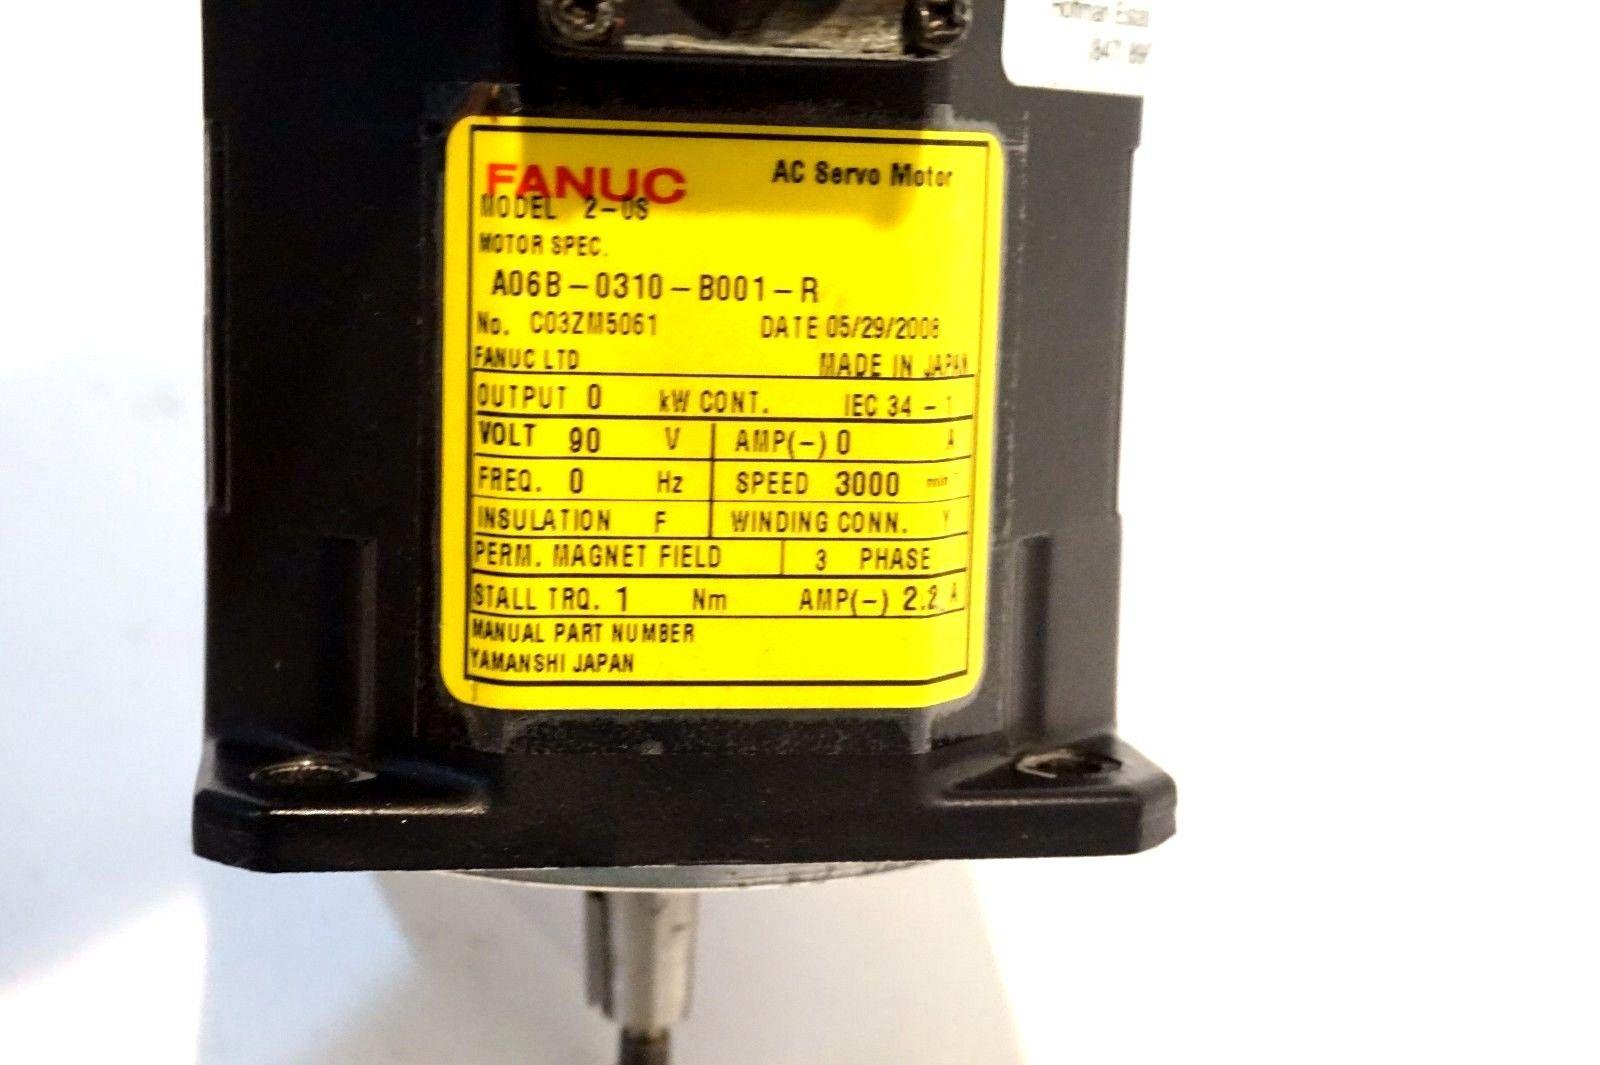 Fanuc Servo Motor Selection Manual